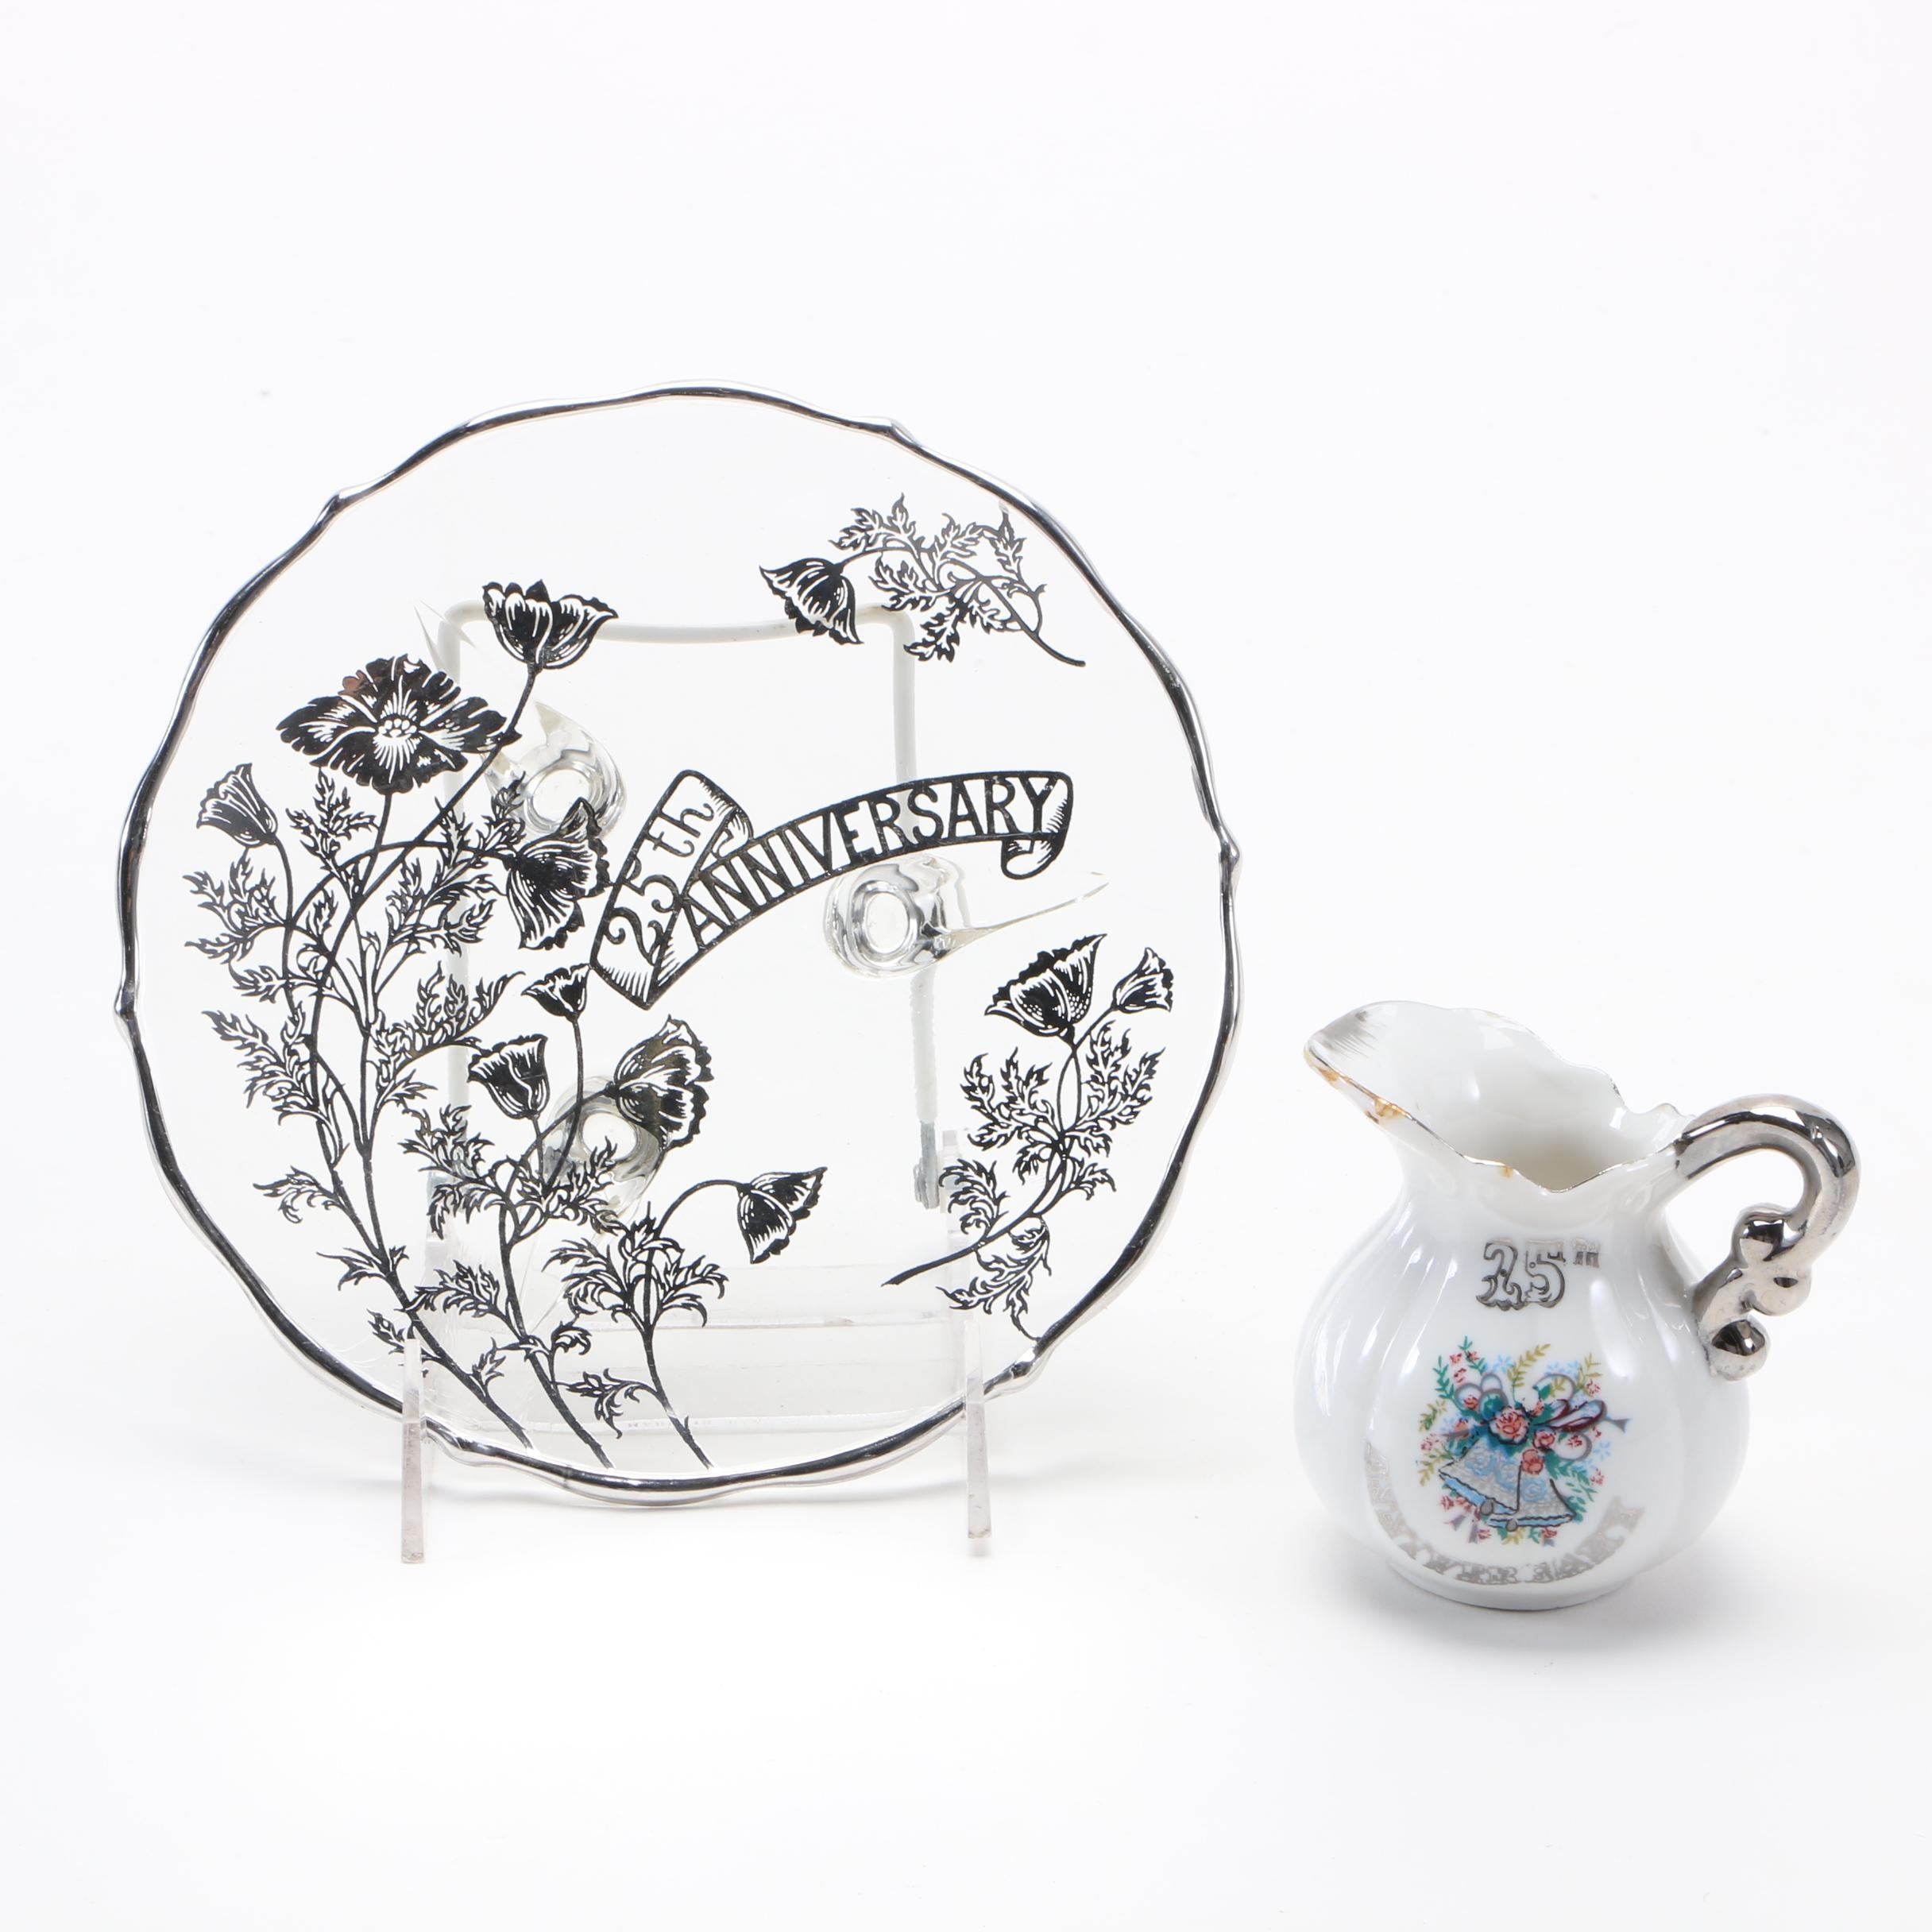 Assortment of 25th Anniversary Tableware